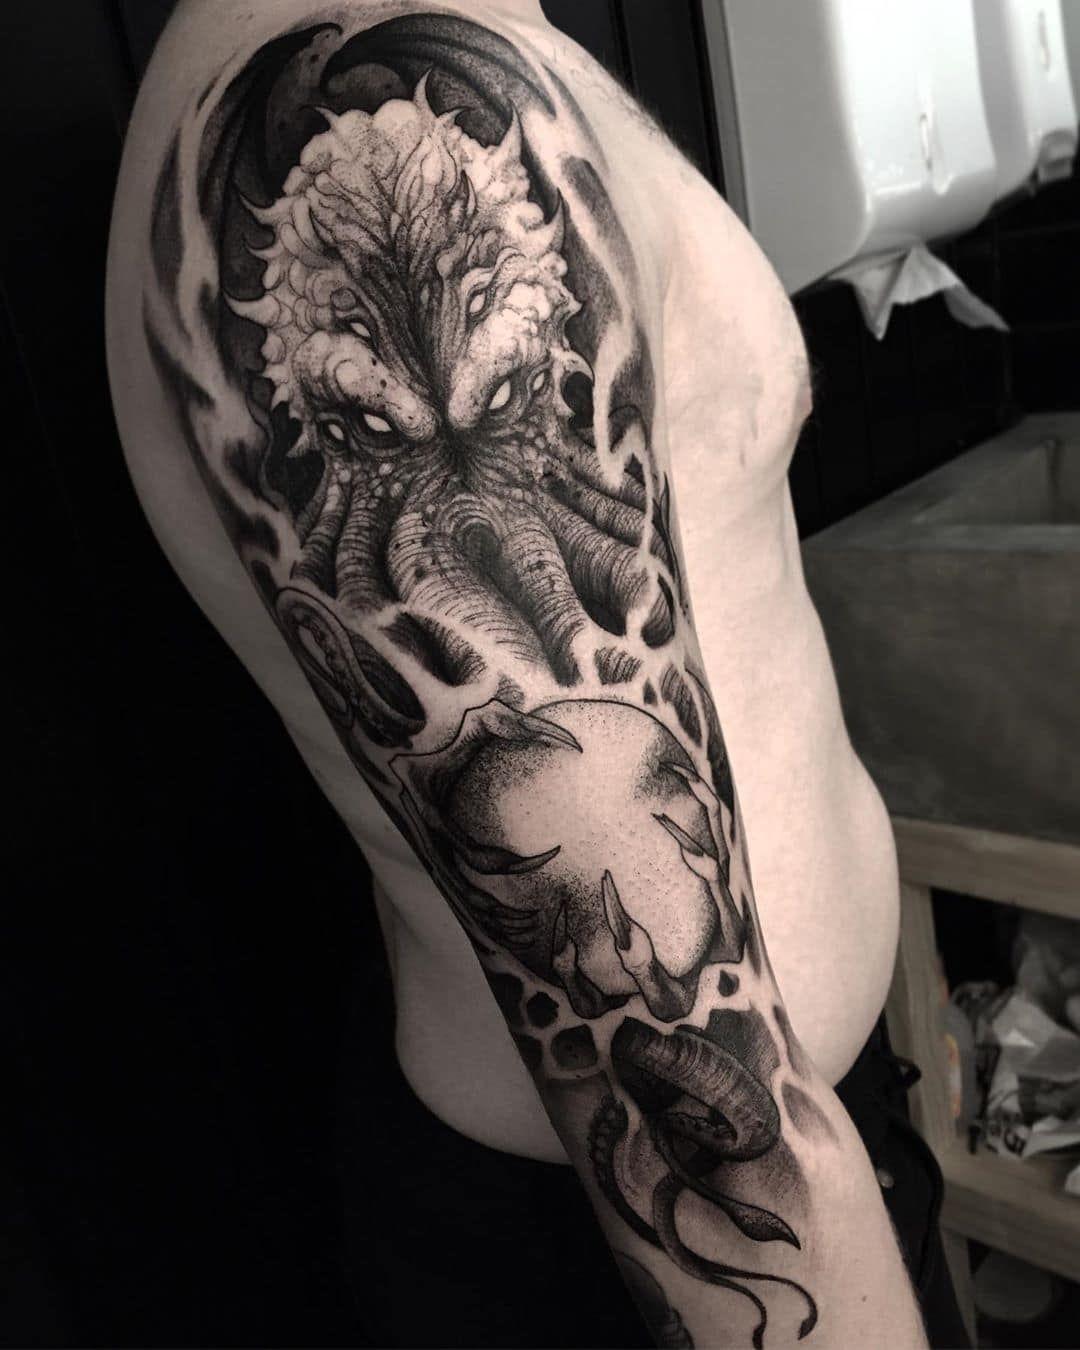 Cthulhu tattoo   Etsy